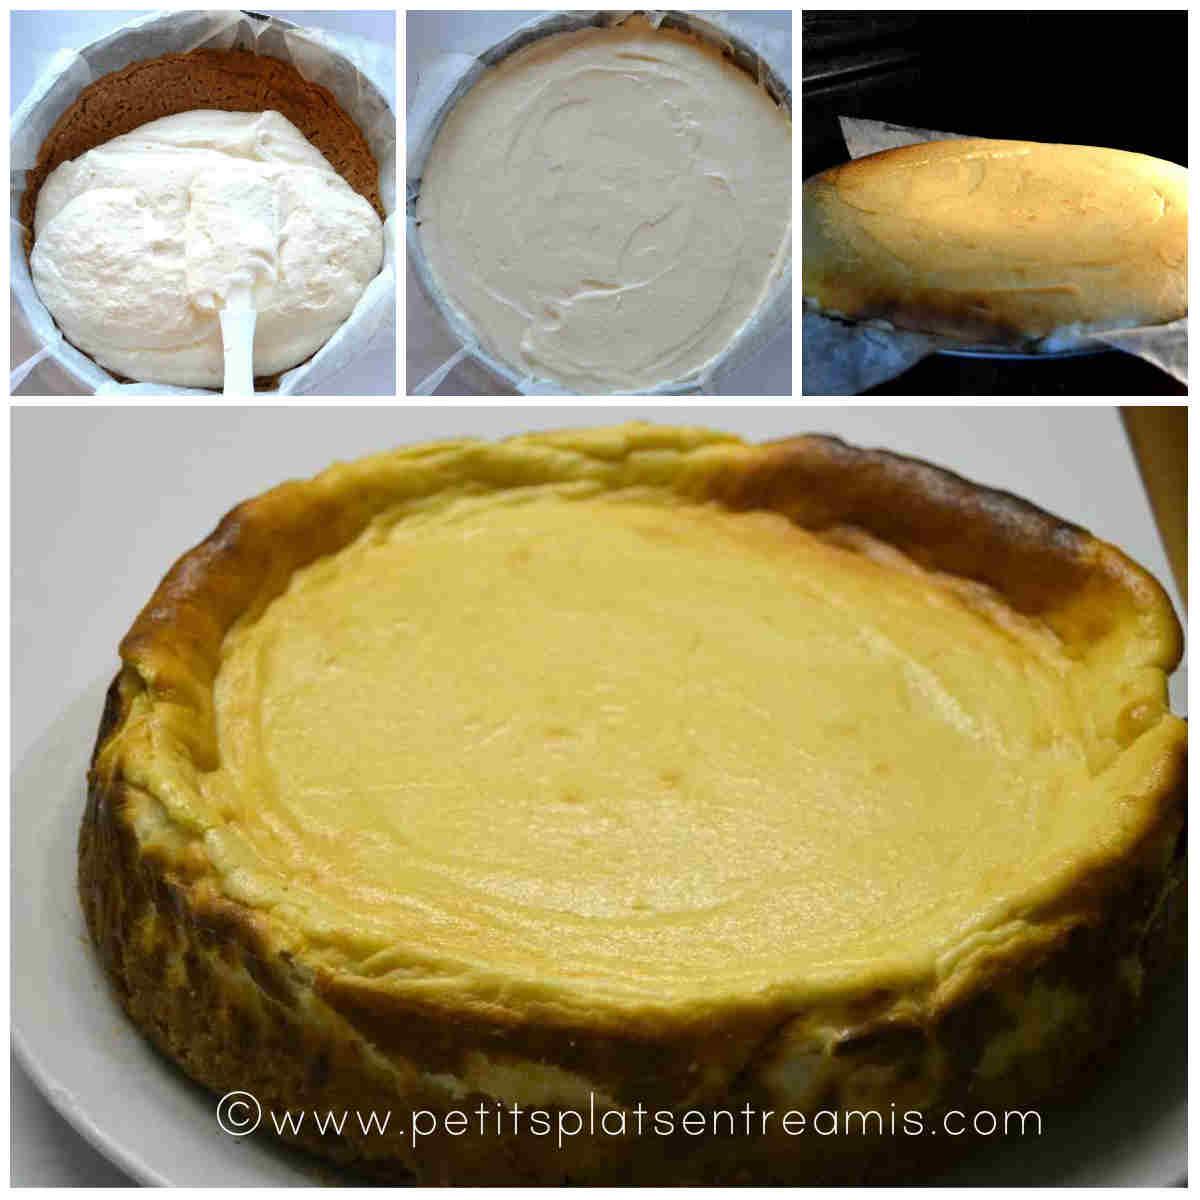 cuisson gâteau au fromage blanc